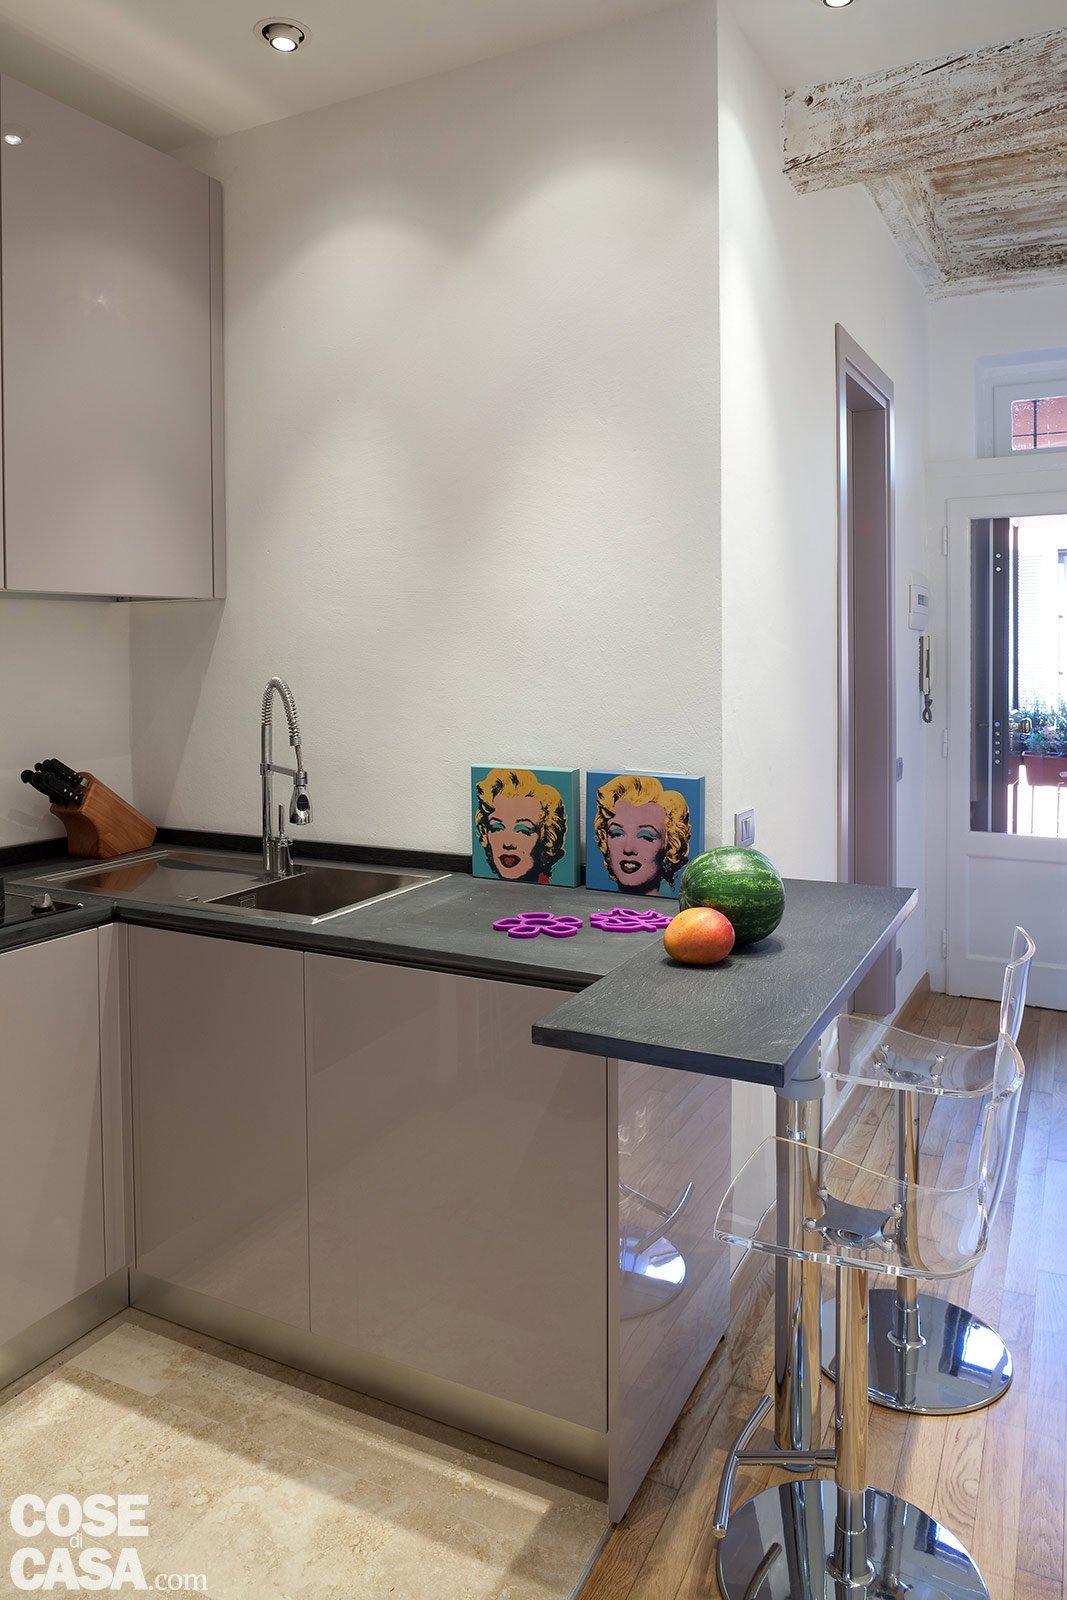 Casabook immobiliare una casa stretta e lunga che - Cucina in casa ...